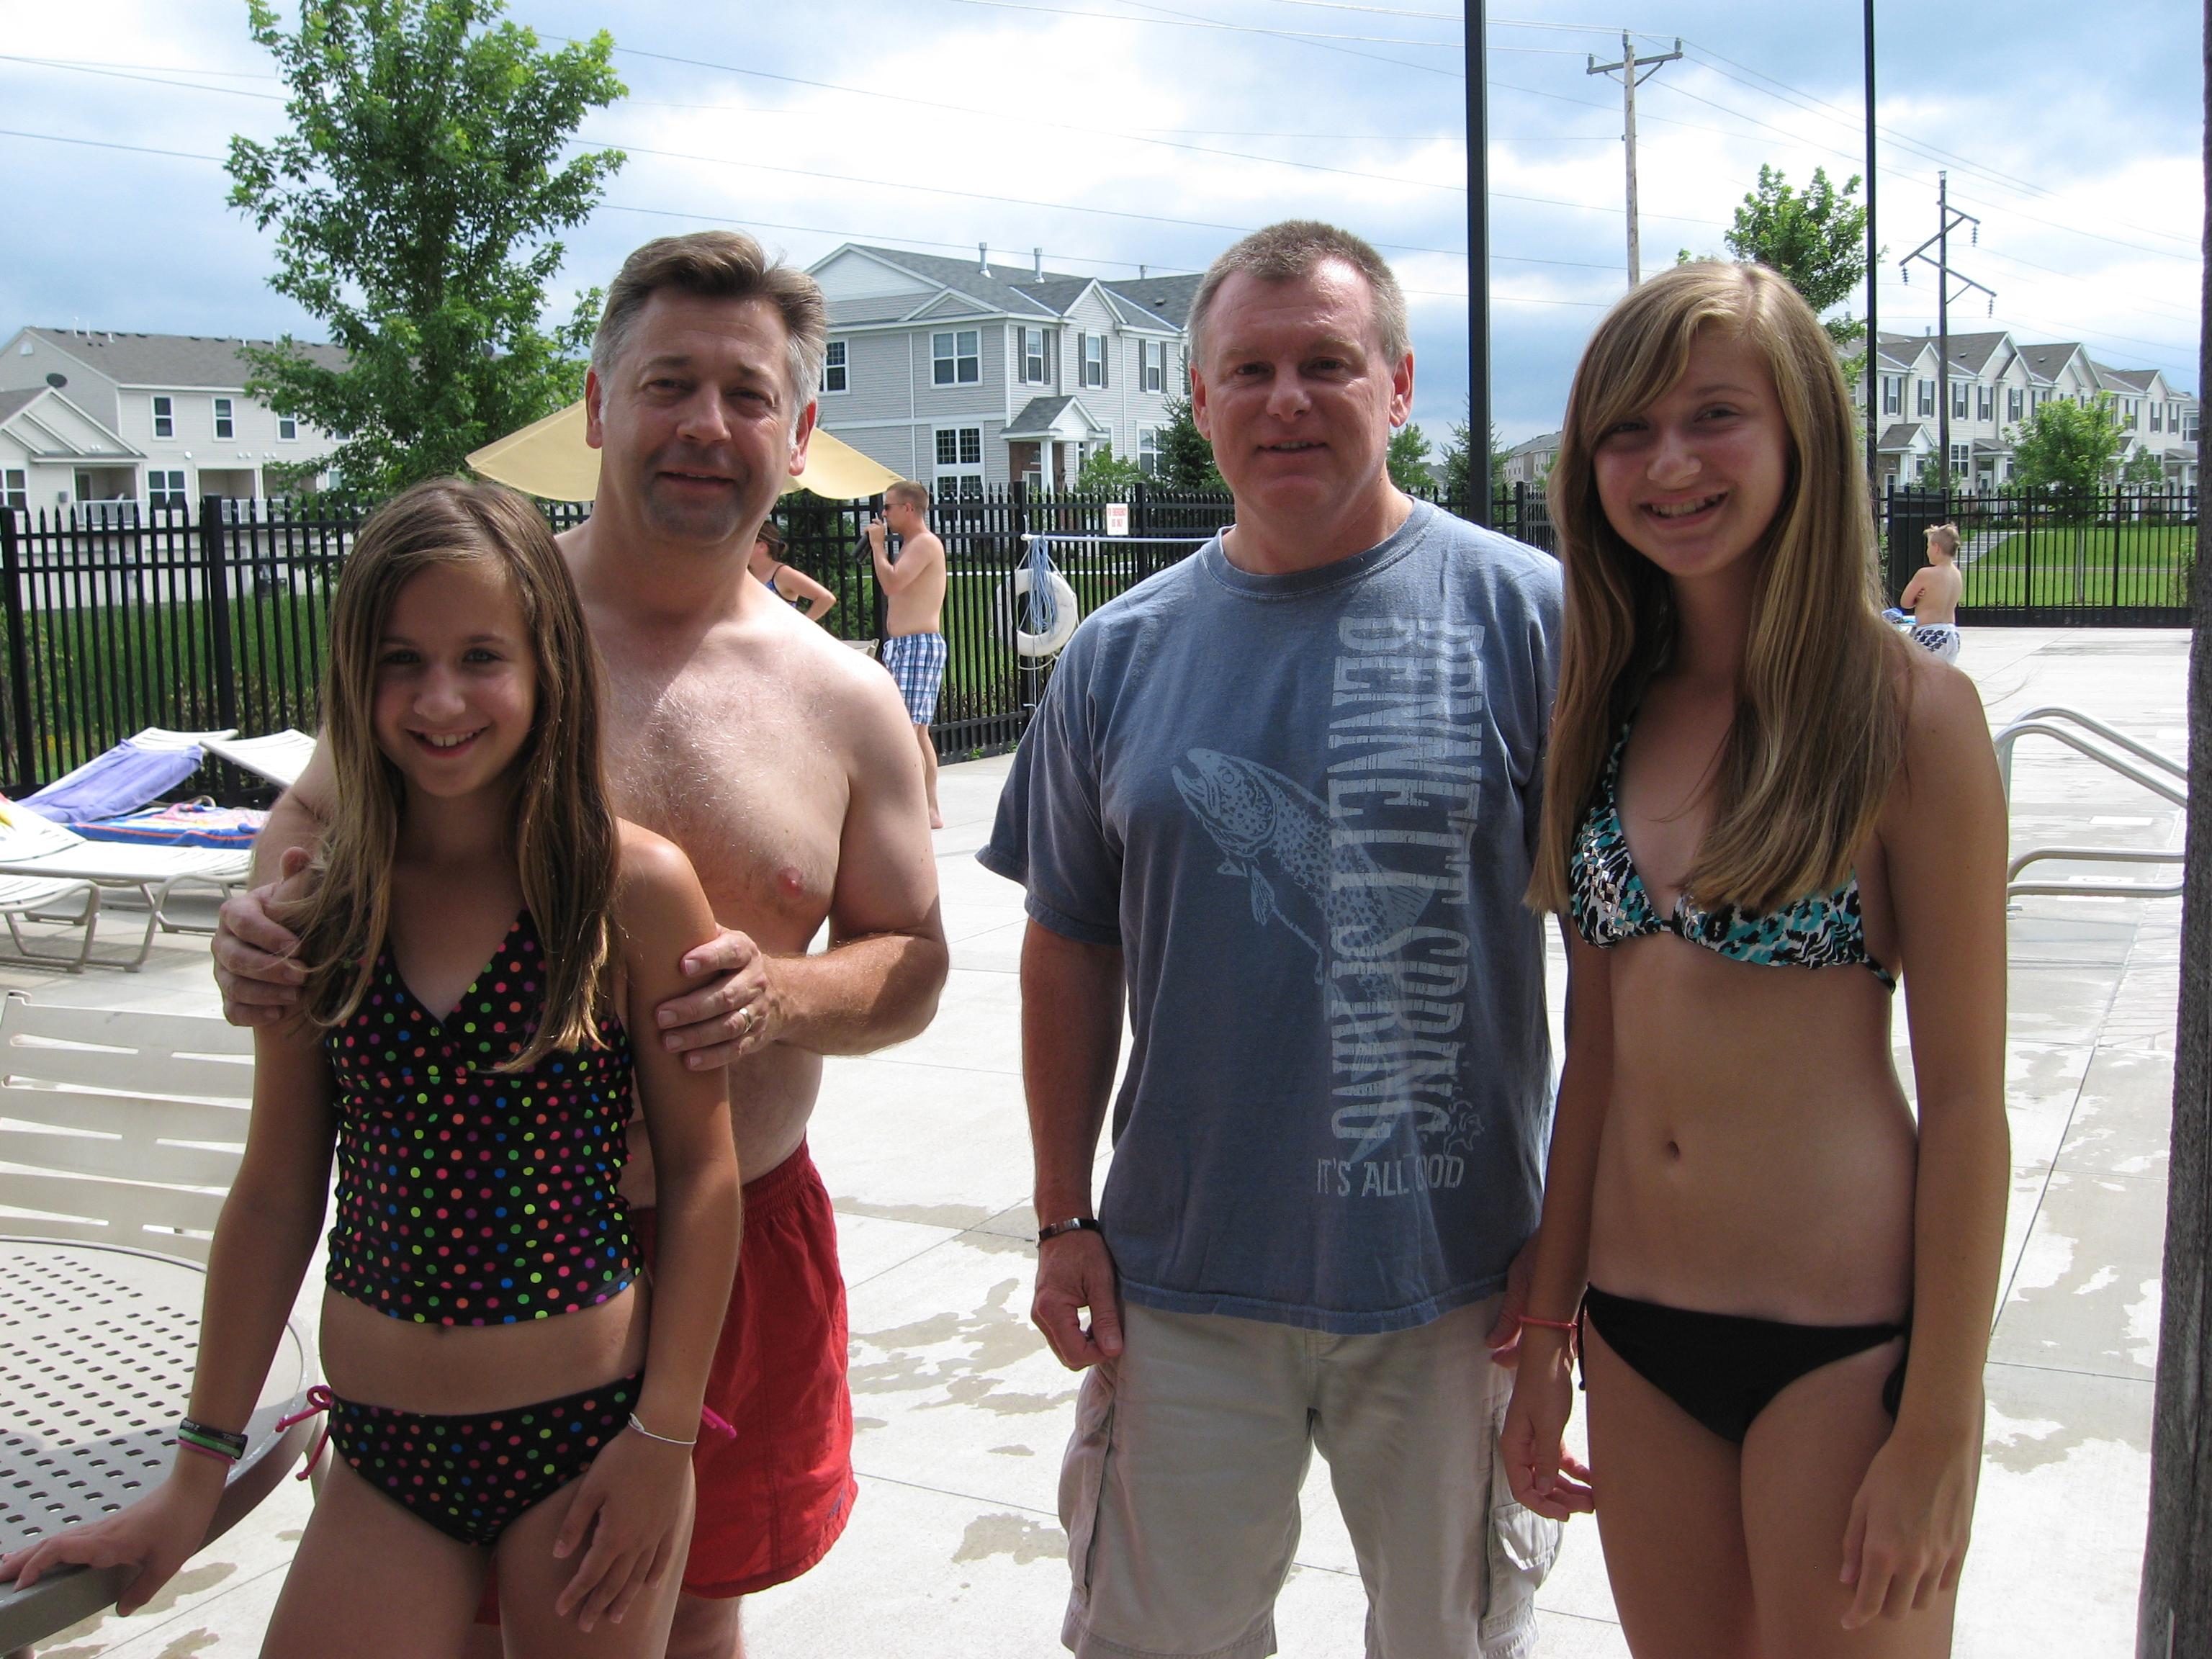 Teen girls flashing at pool party useful